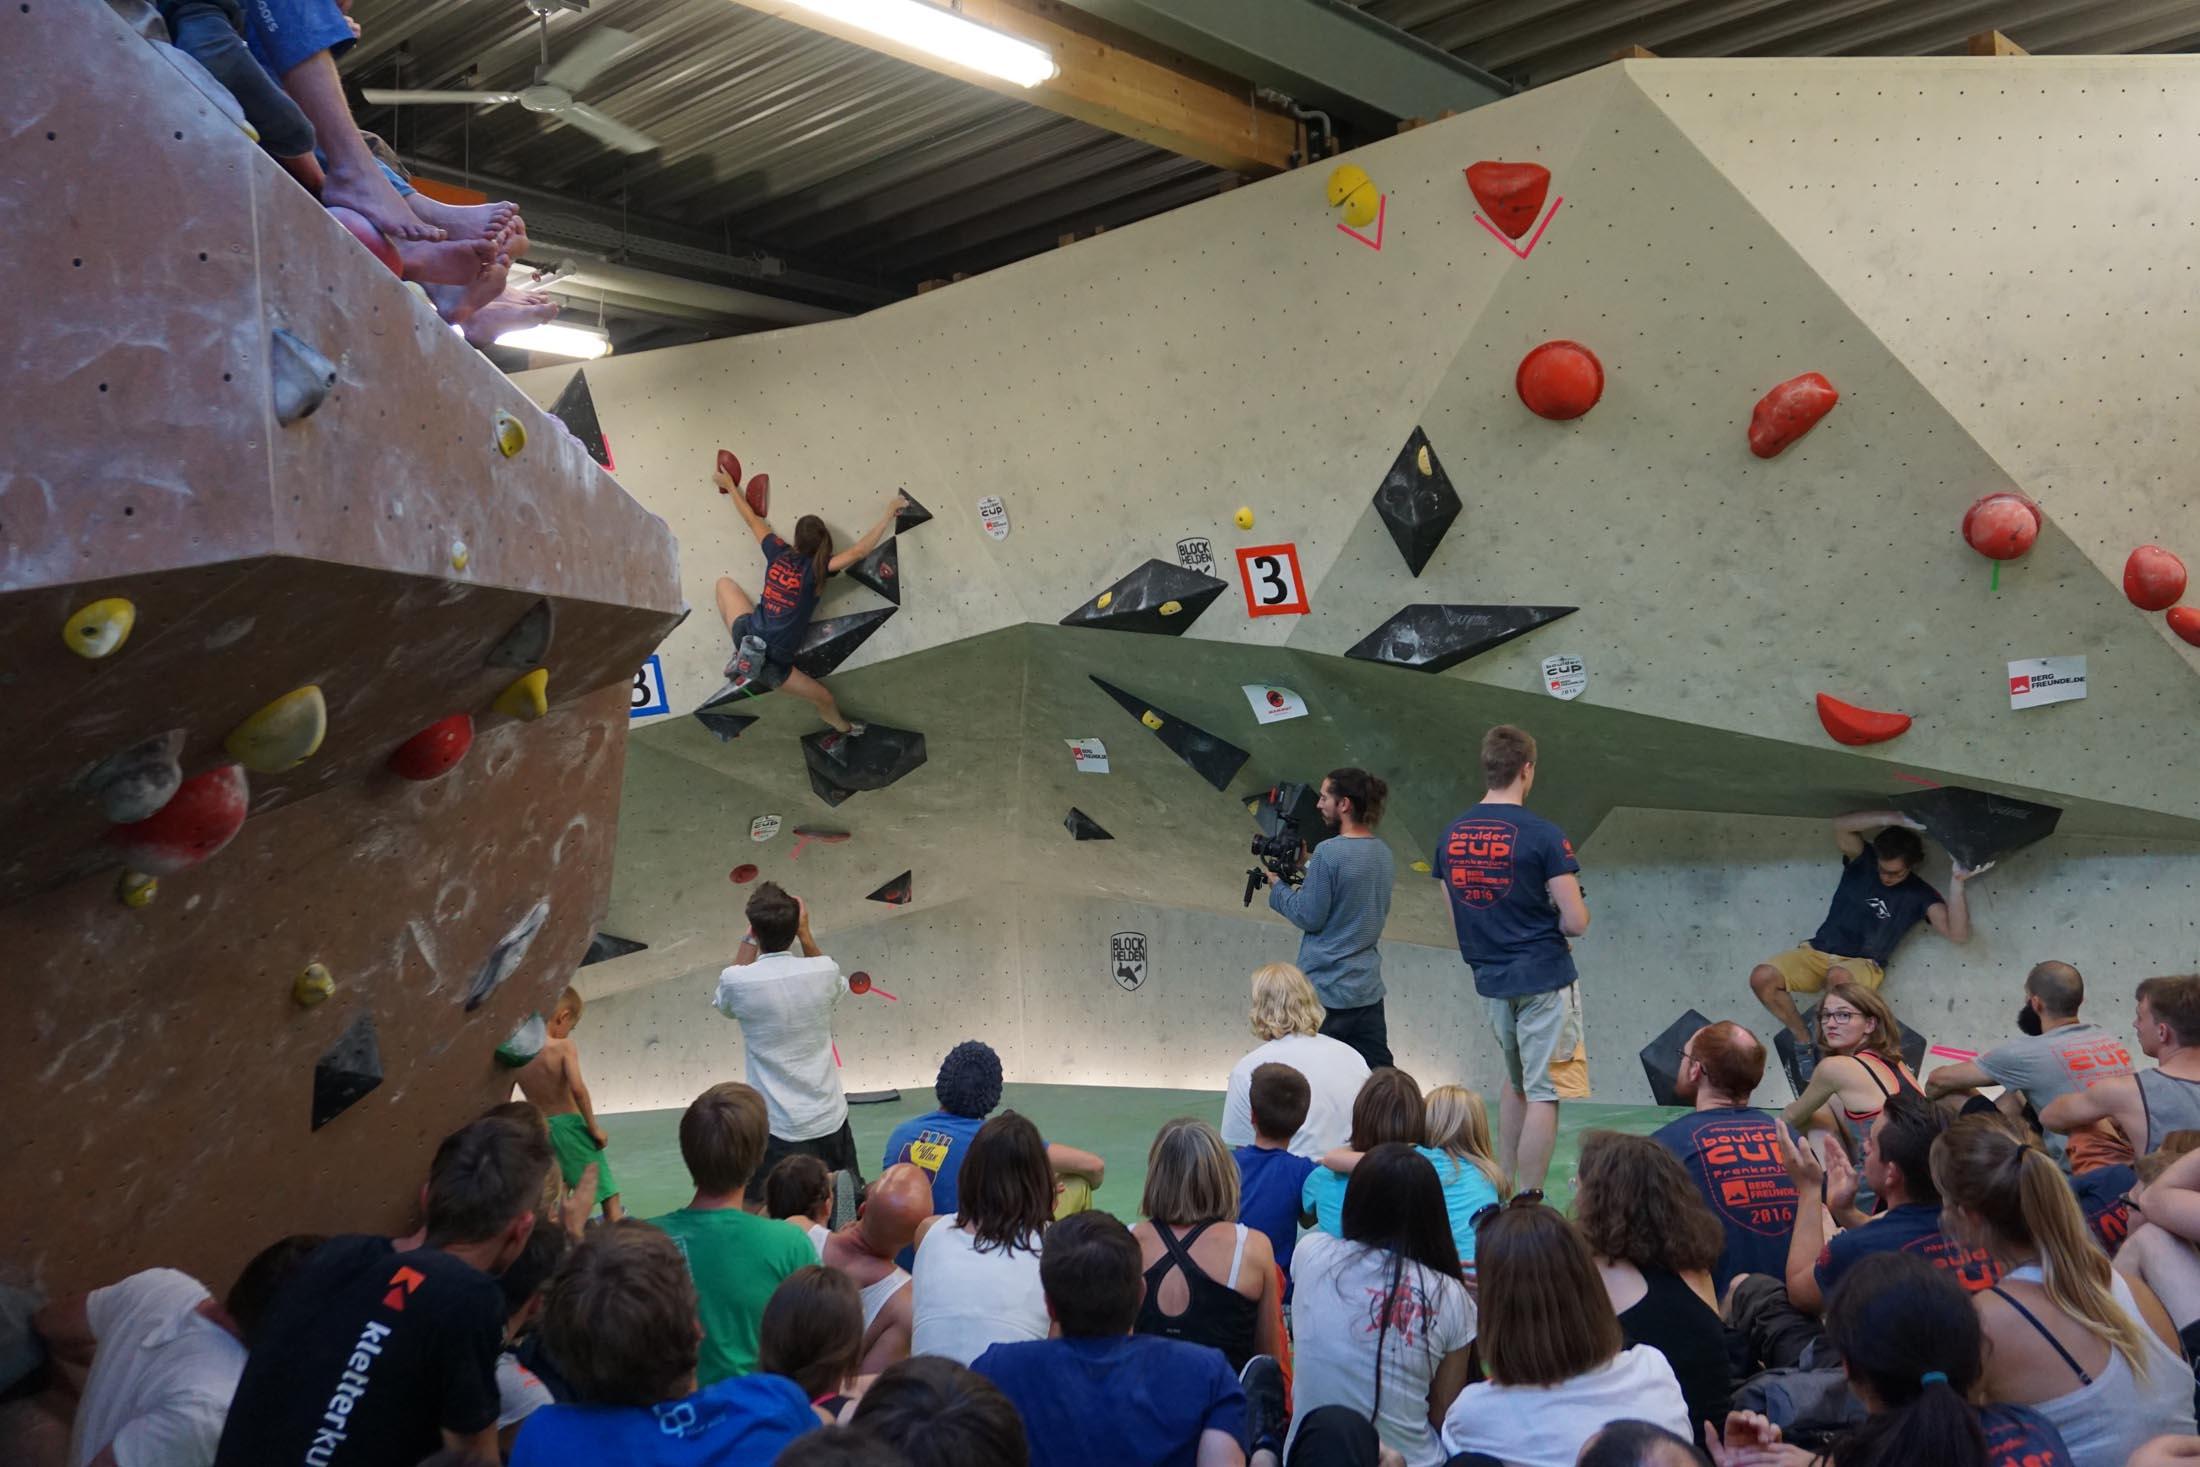 Finale, internationaler bouldercup Frankenjura 2016, BLOCKHELDEN Erlangen, Mammut, Bergfreunde.de, Boulderwettkampf07092016713